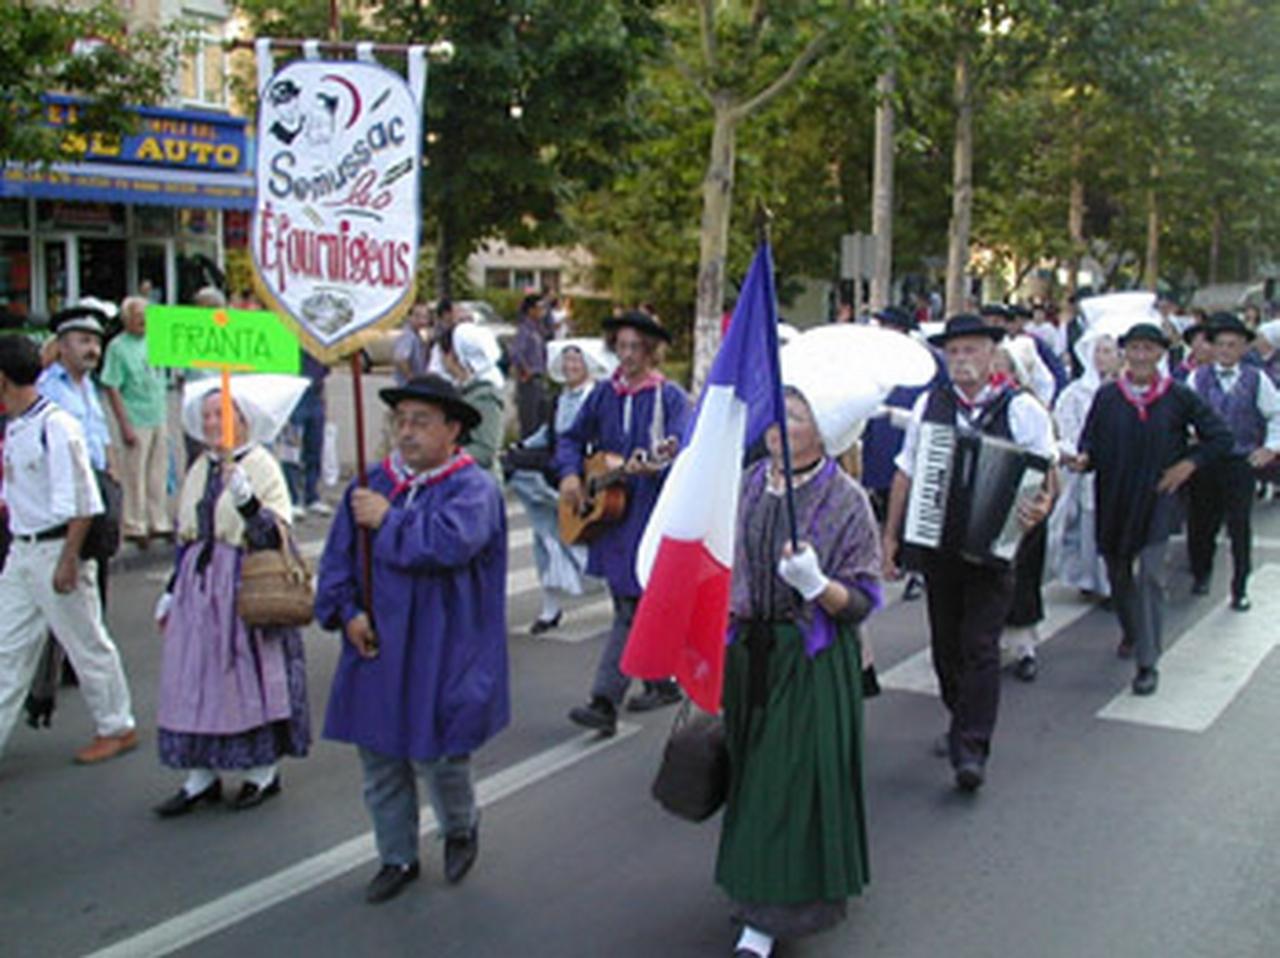 2003 - Ansamblul folcloric \'\'Les Efournigeas\'\' - Franta